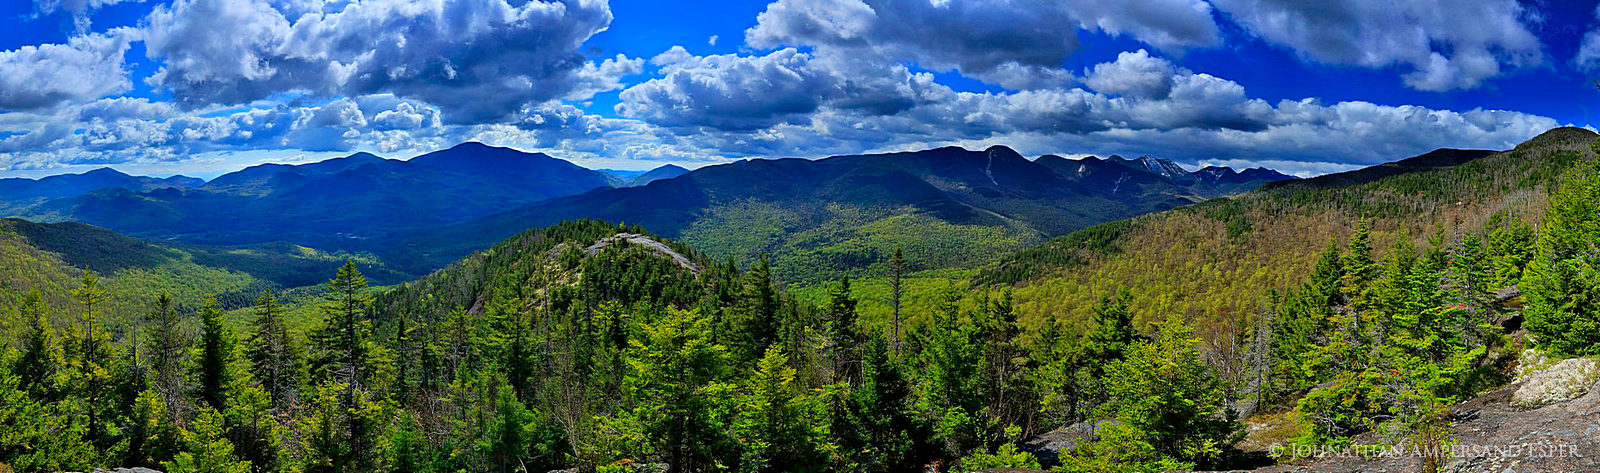 Johns Brook Valley, Big Slide Mt,Big Slide, Great Range,Adirondack High Peaks,High Peaks,range,Adirondack mountains,Adirondacks,mountains,spring,springtime,First Brother,ridgeline,Giant Mt,Lower Wolf , photo